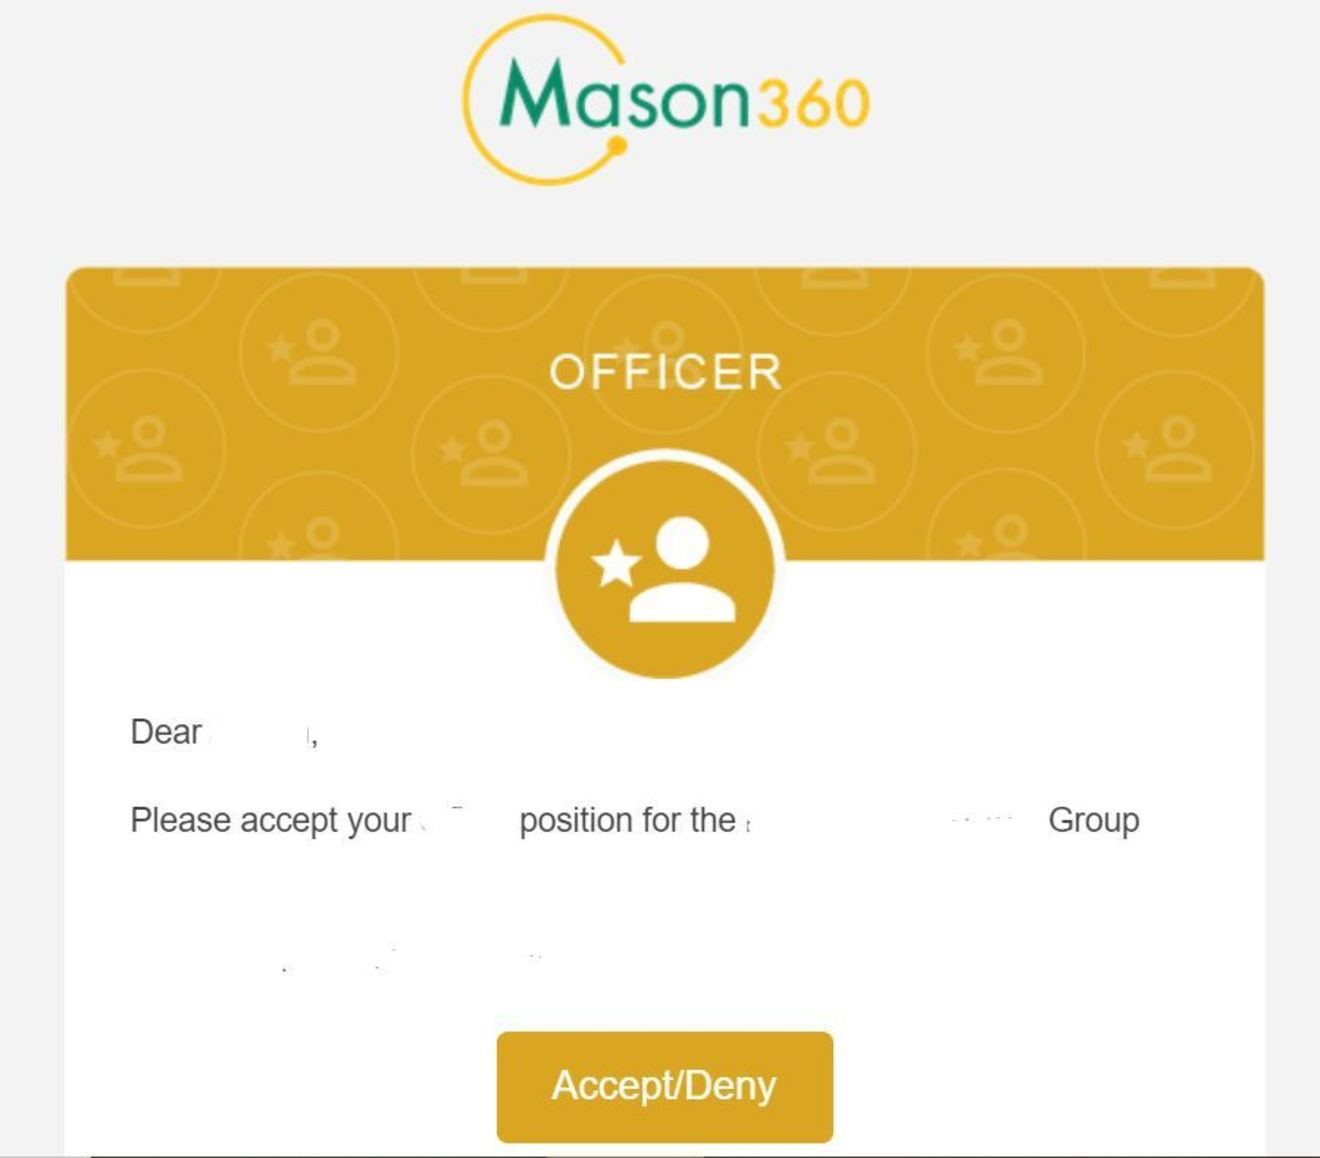 Sample Officer Email